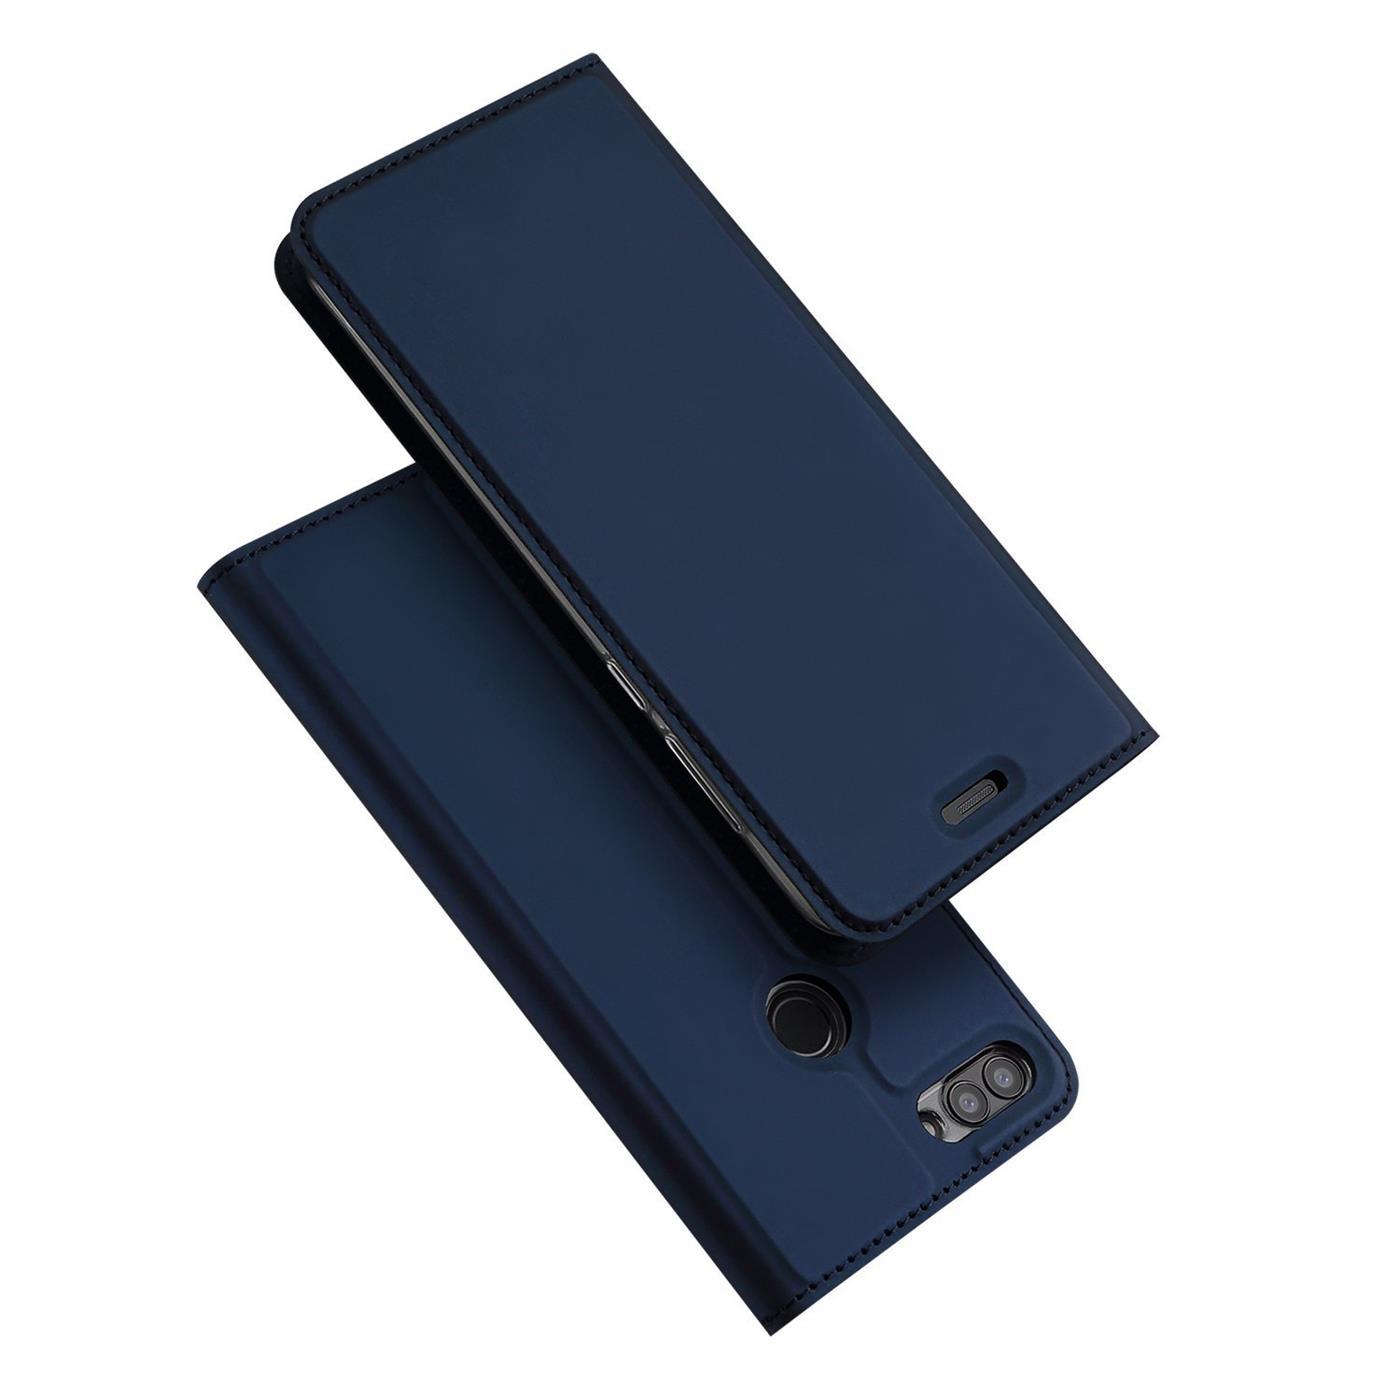 huawei p smart tui rabattable t l phone portable pochette. Black Bedroom Furniture Sets. Home Design Ideas